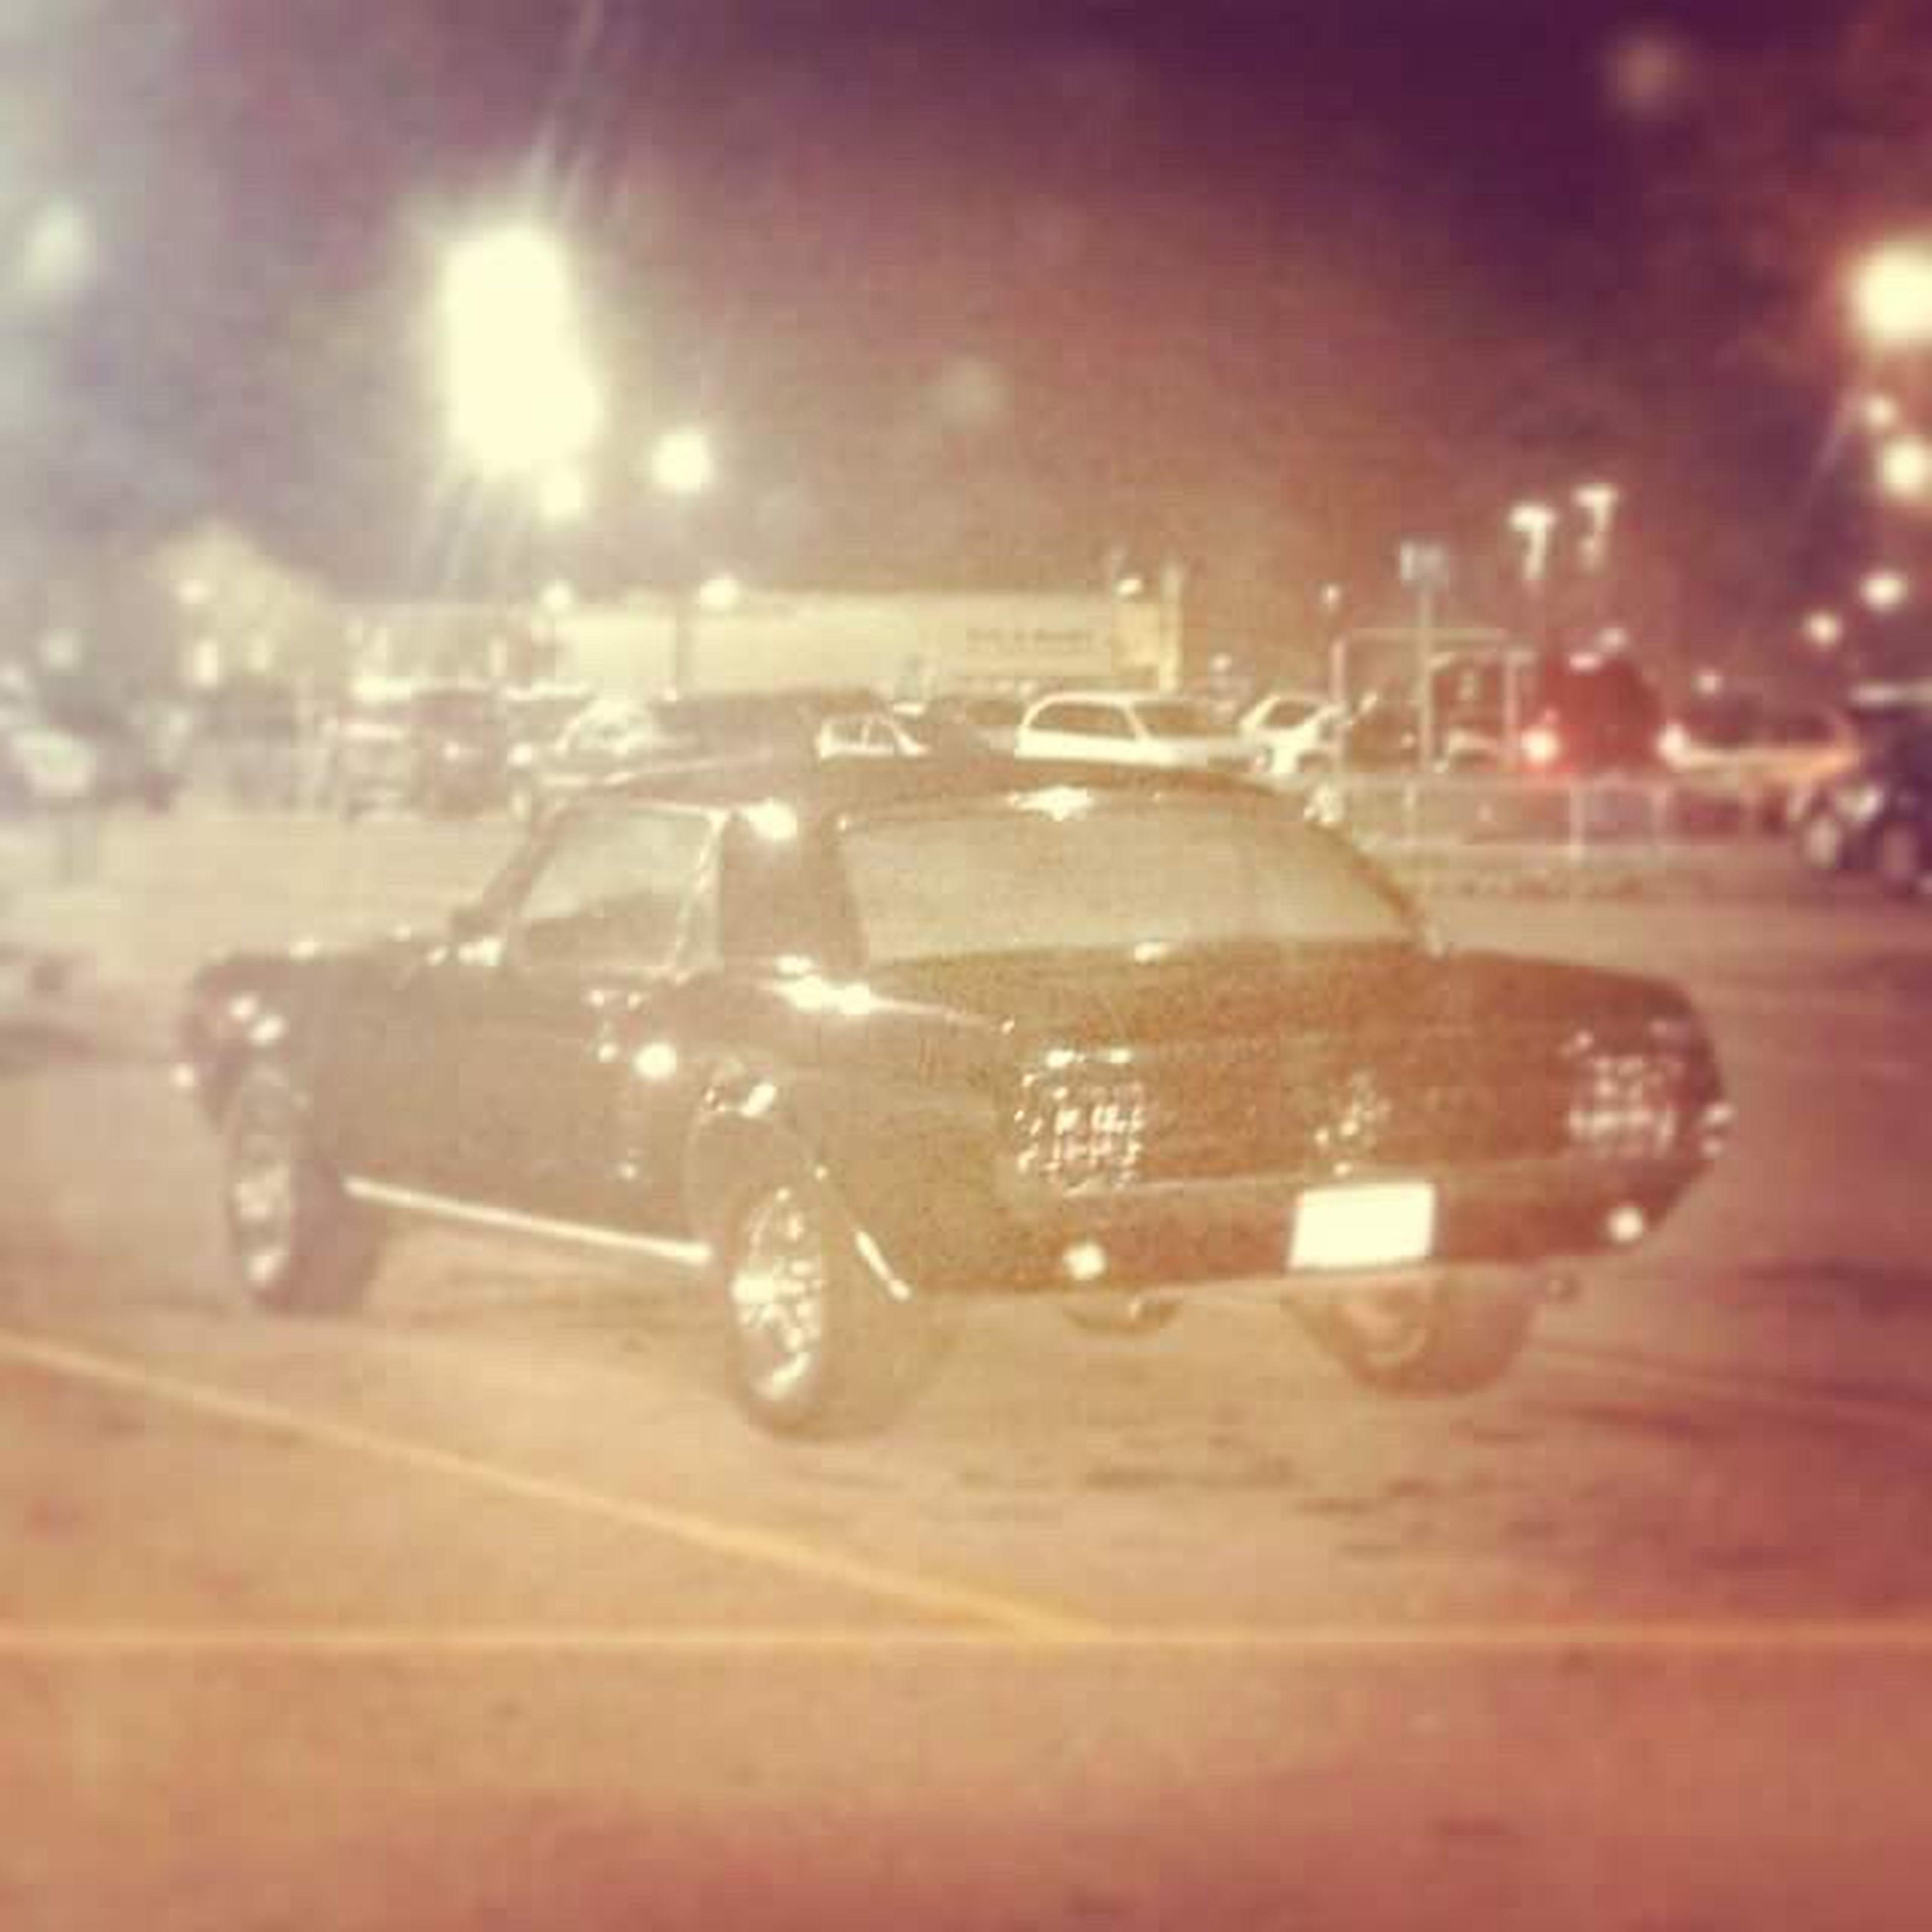 car, transportation, army, illuminated, no people, outdoors, night, racecar, police car